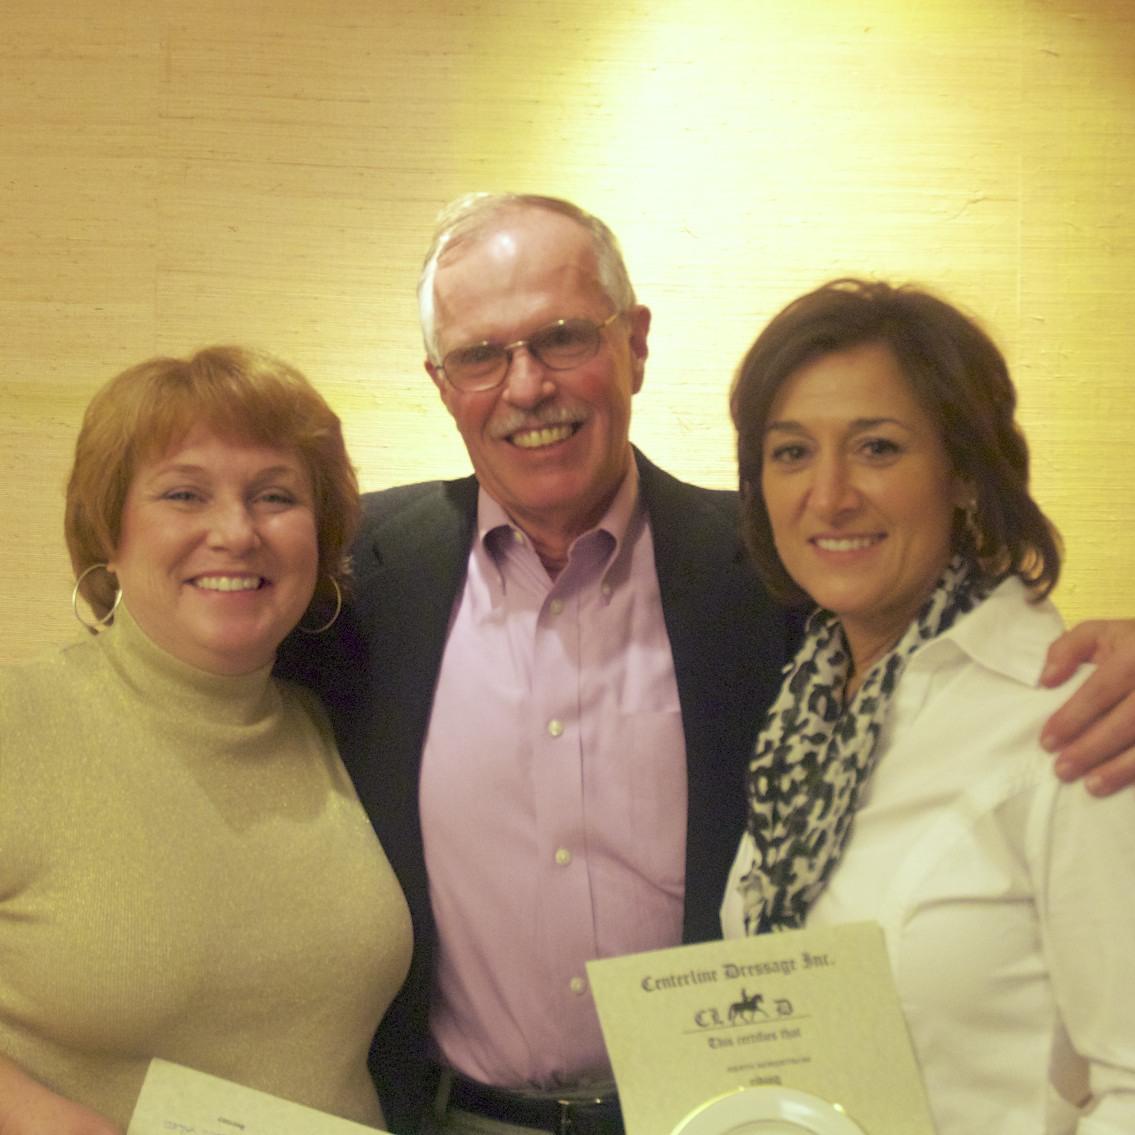 Paula Briney, Ted Sunder, & Judy Nordstrom